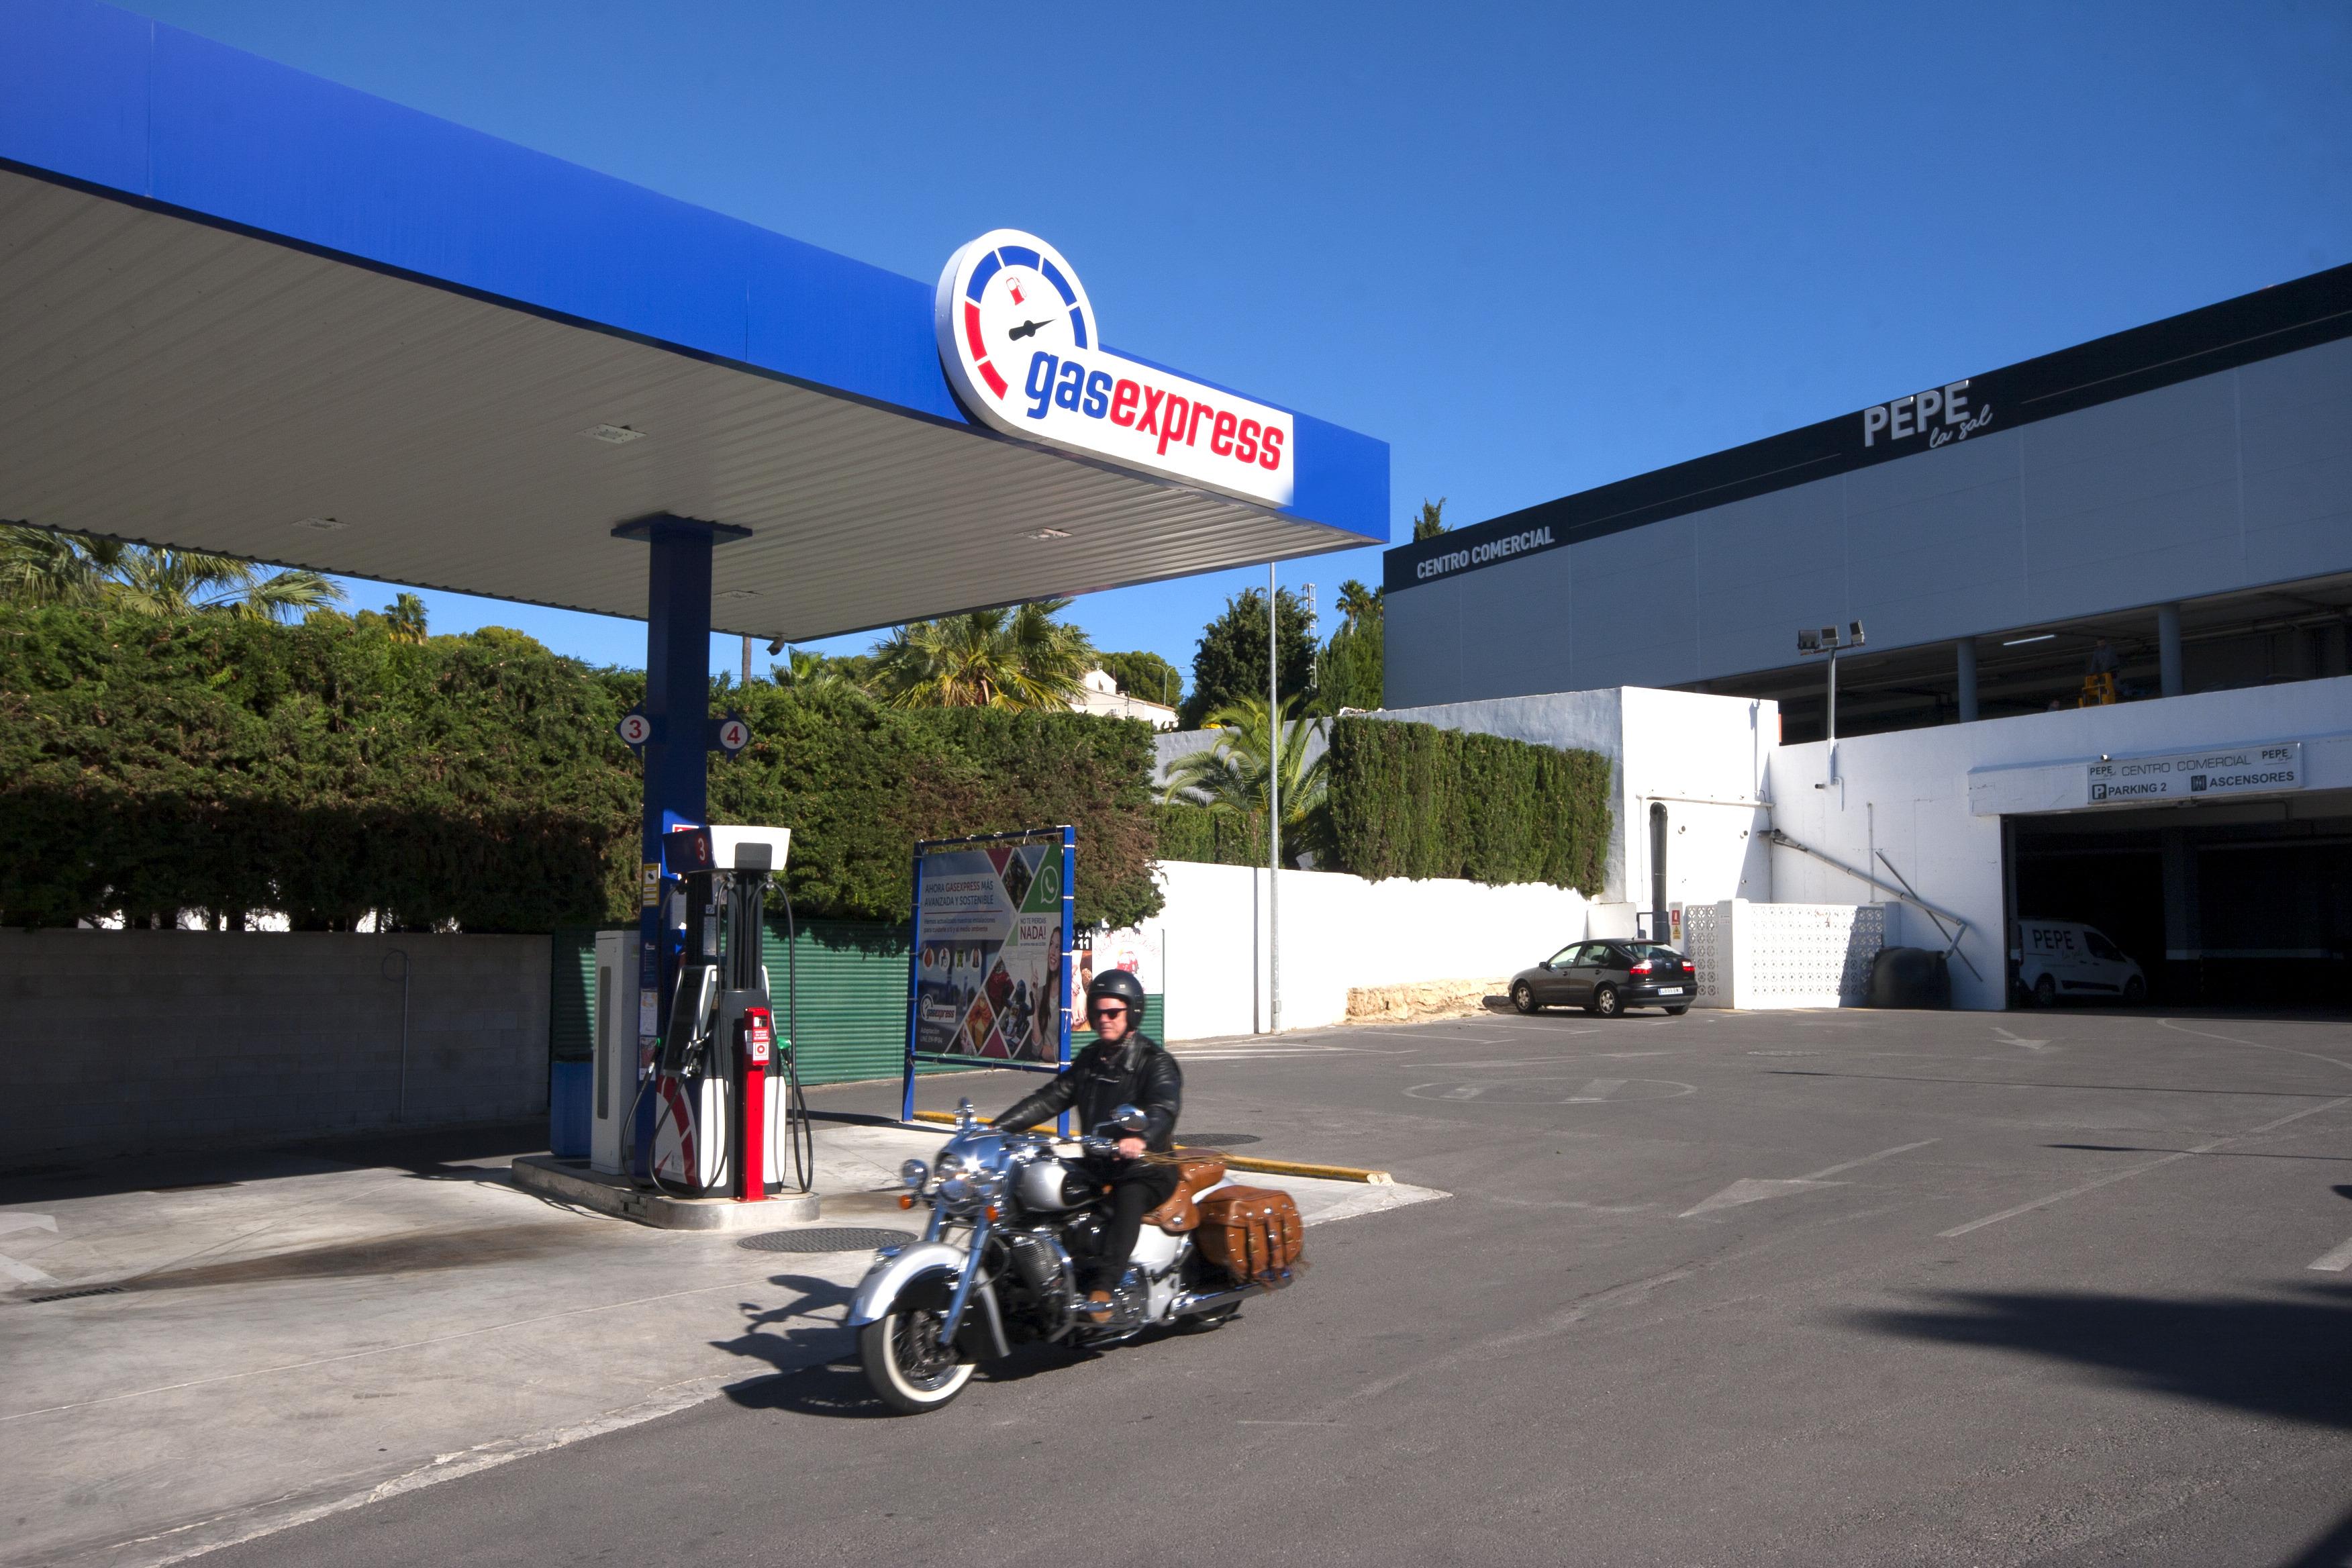 Petrol Station in San Jaime - Moraira